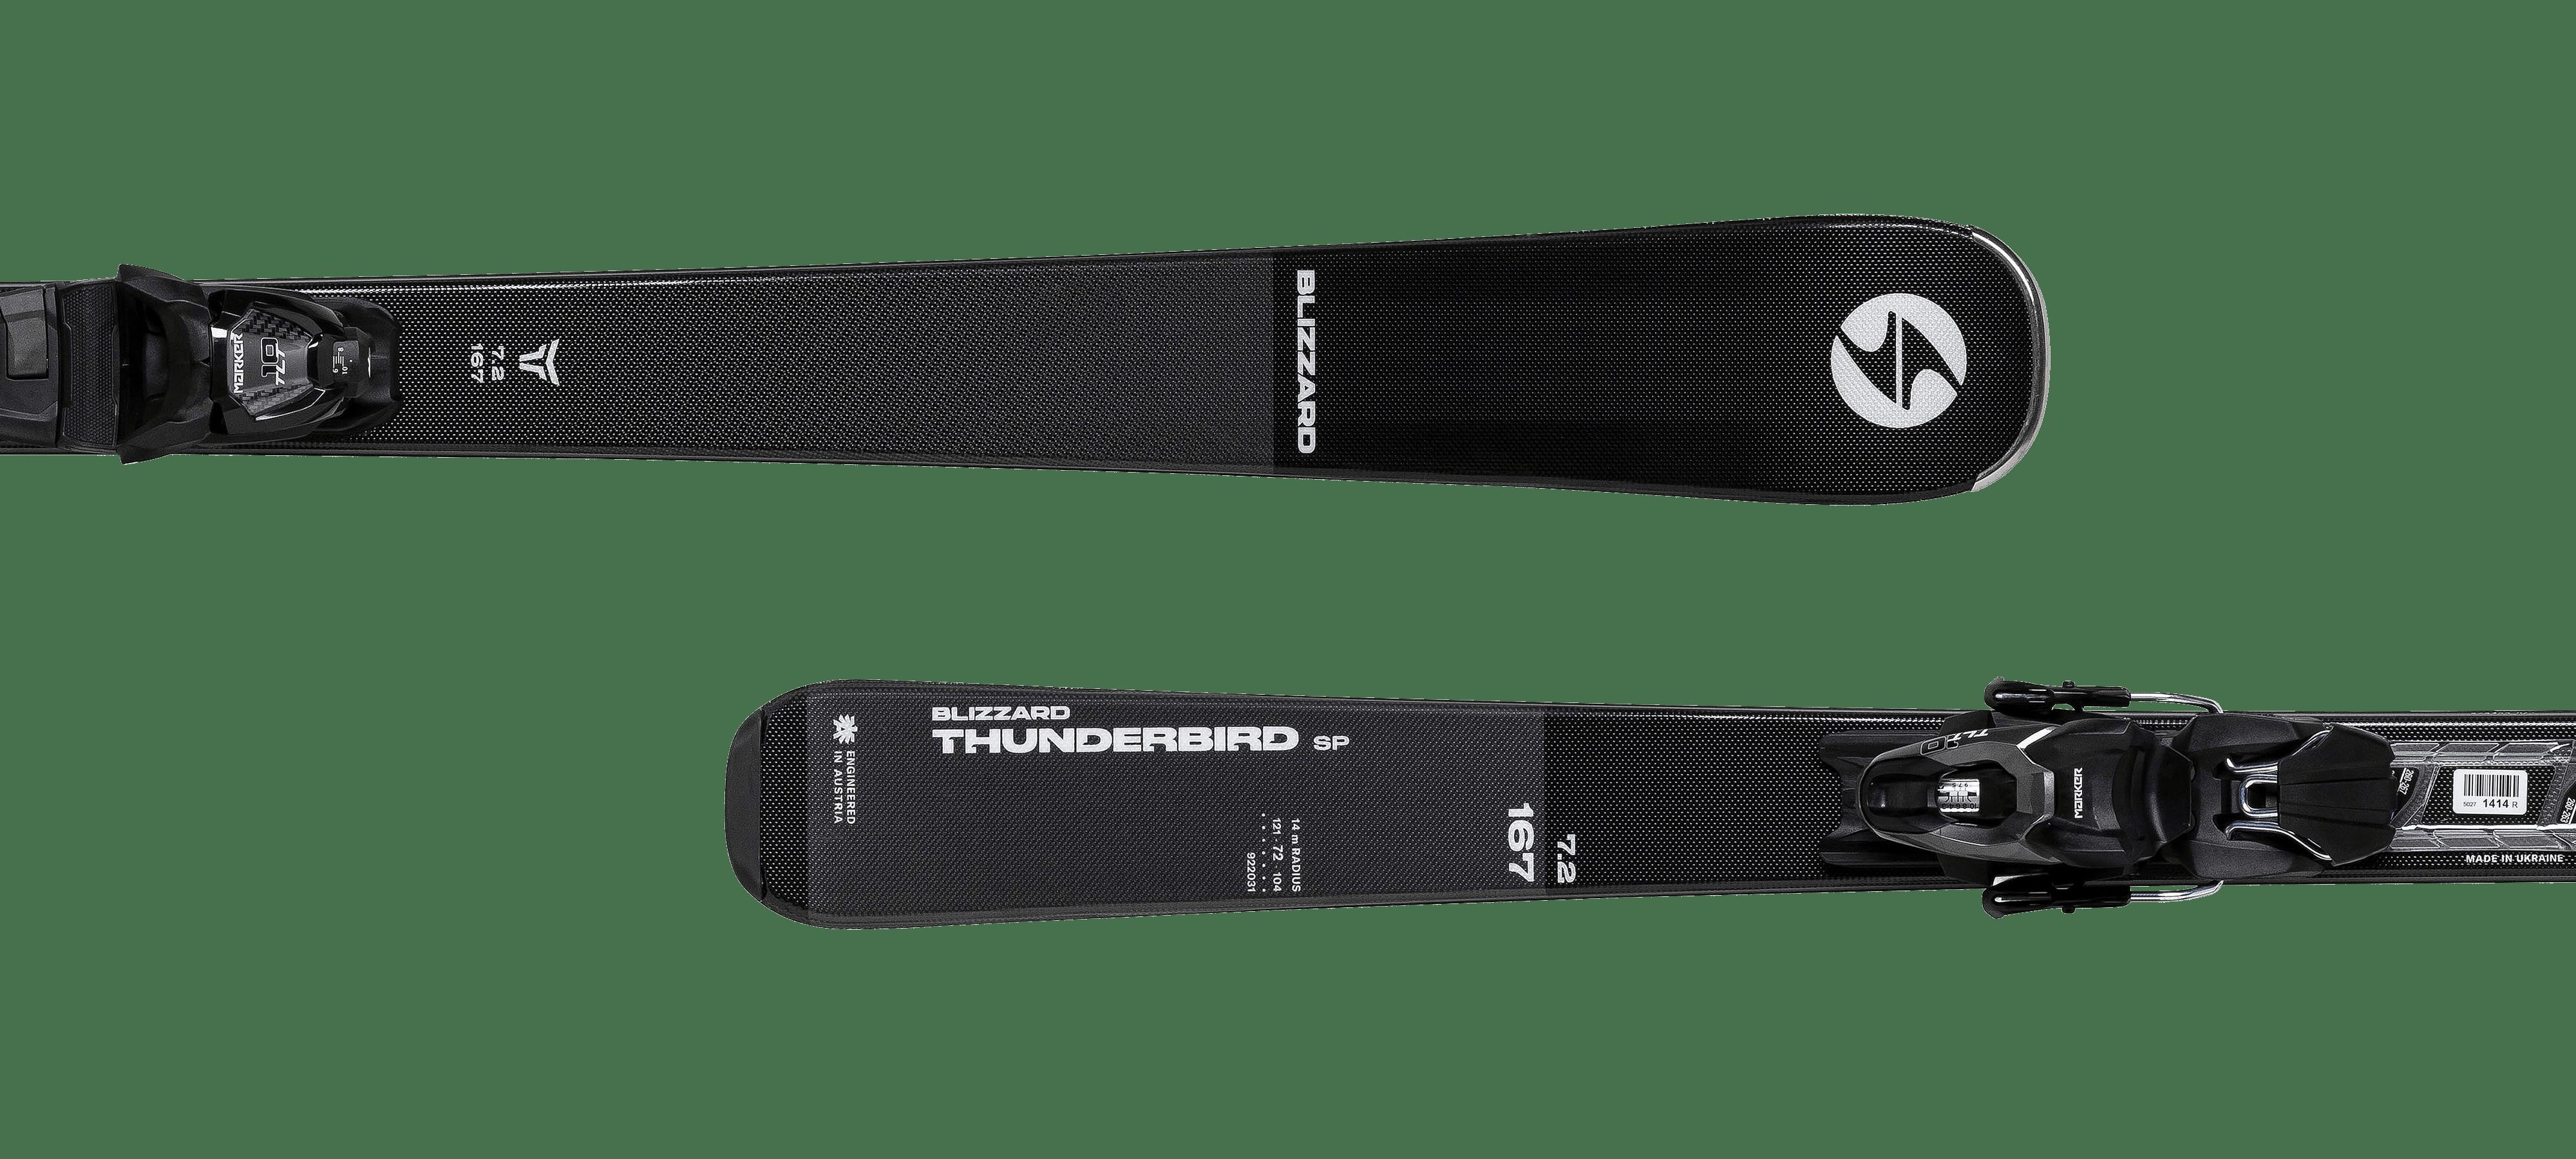 BLIZZARD THUNDERBIRD SP 7.2 + TLT 10 DEMO